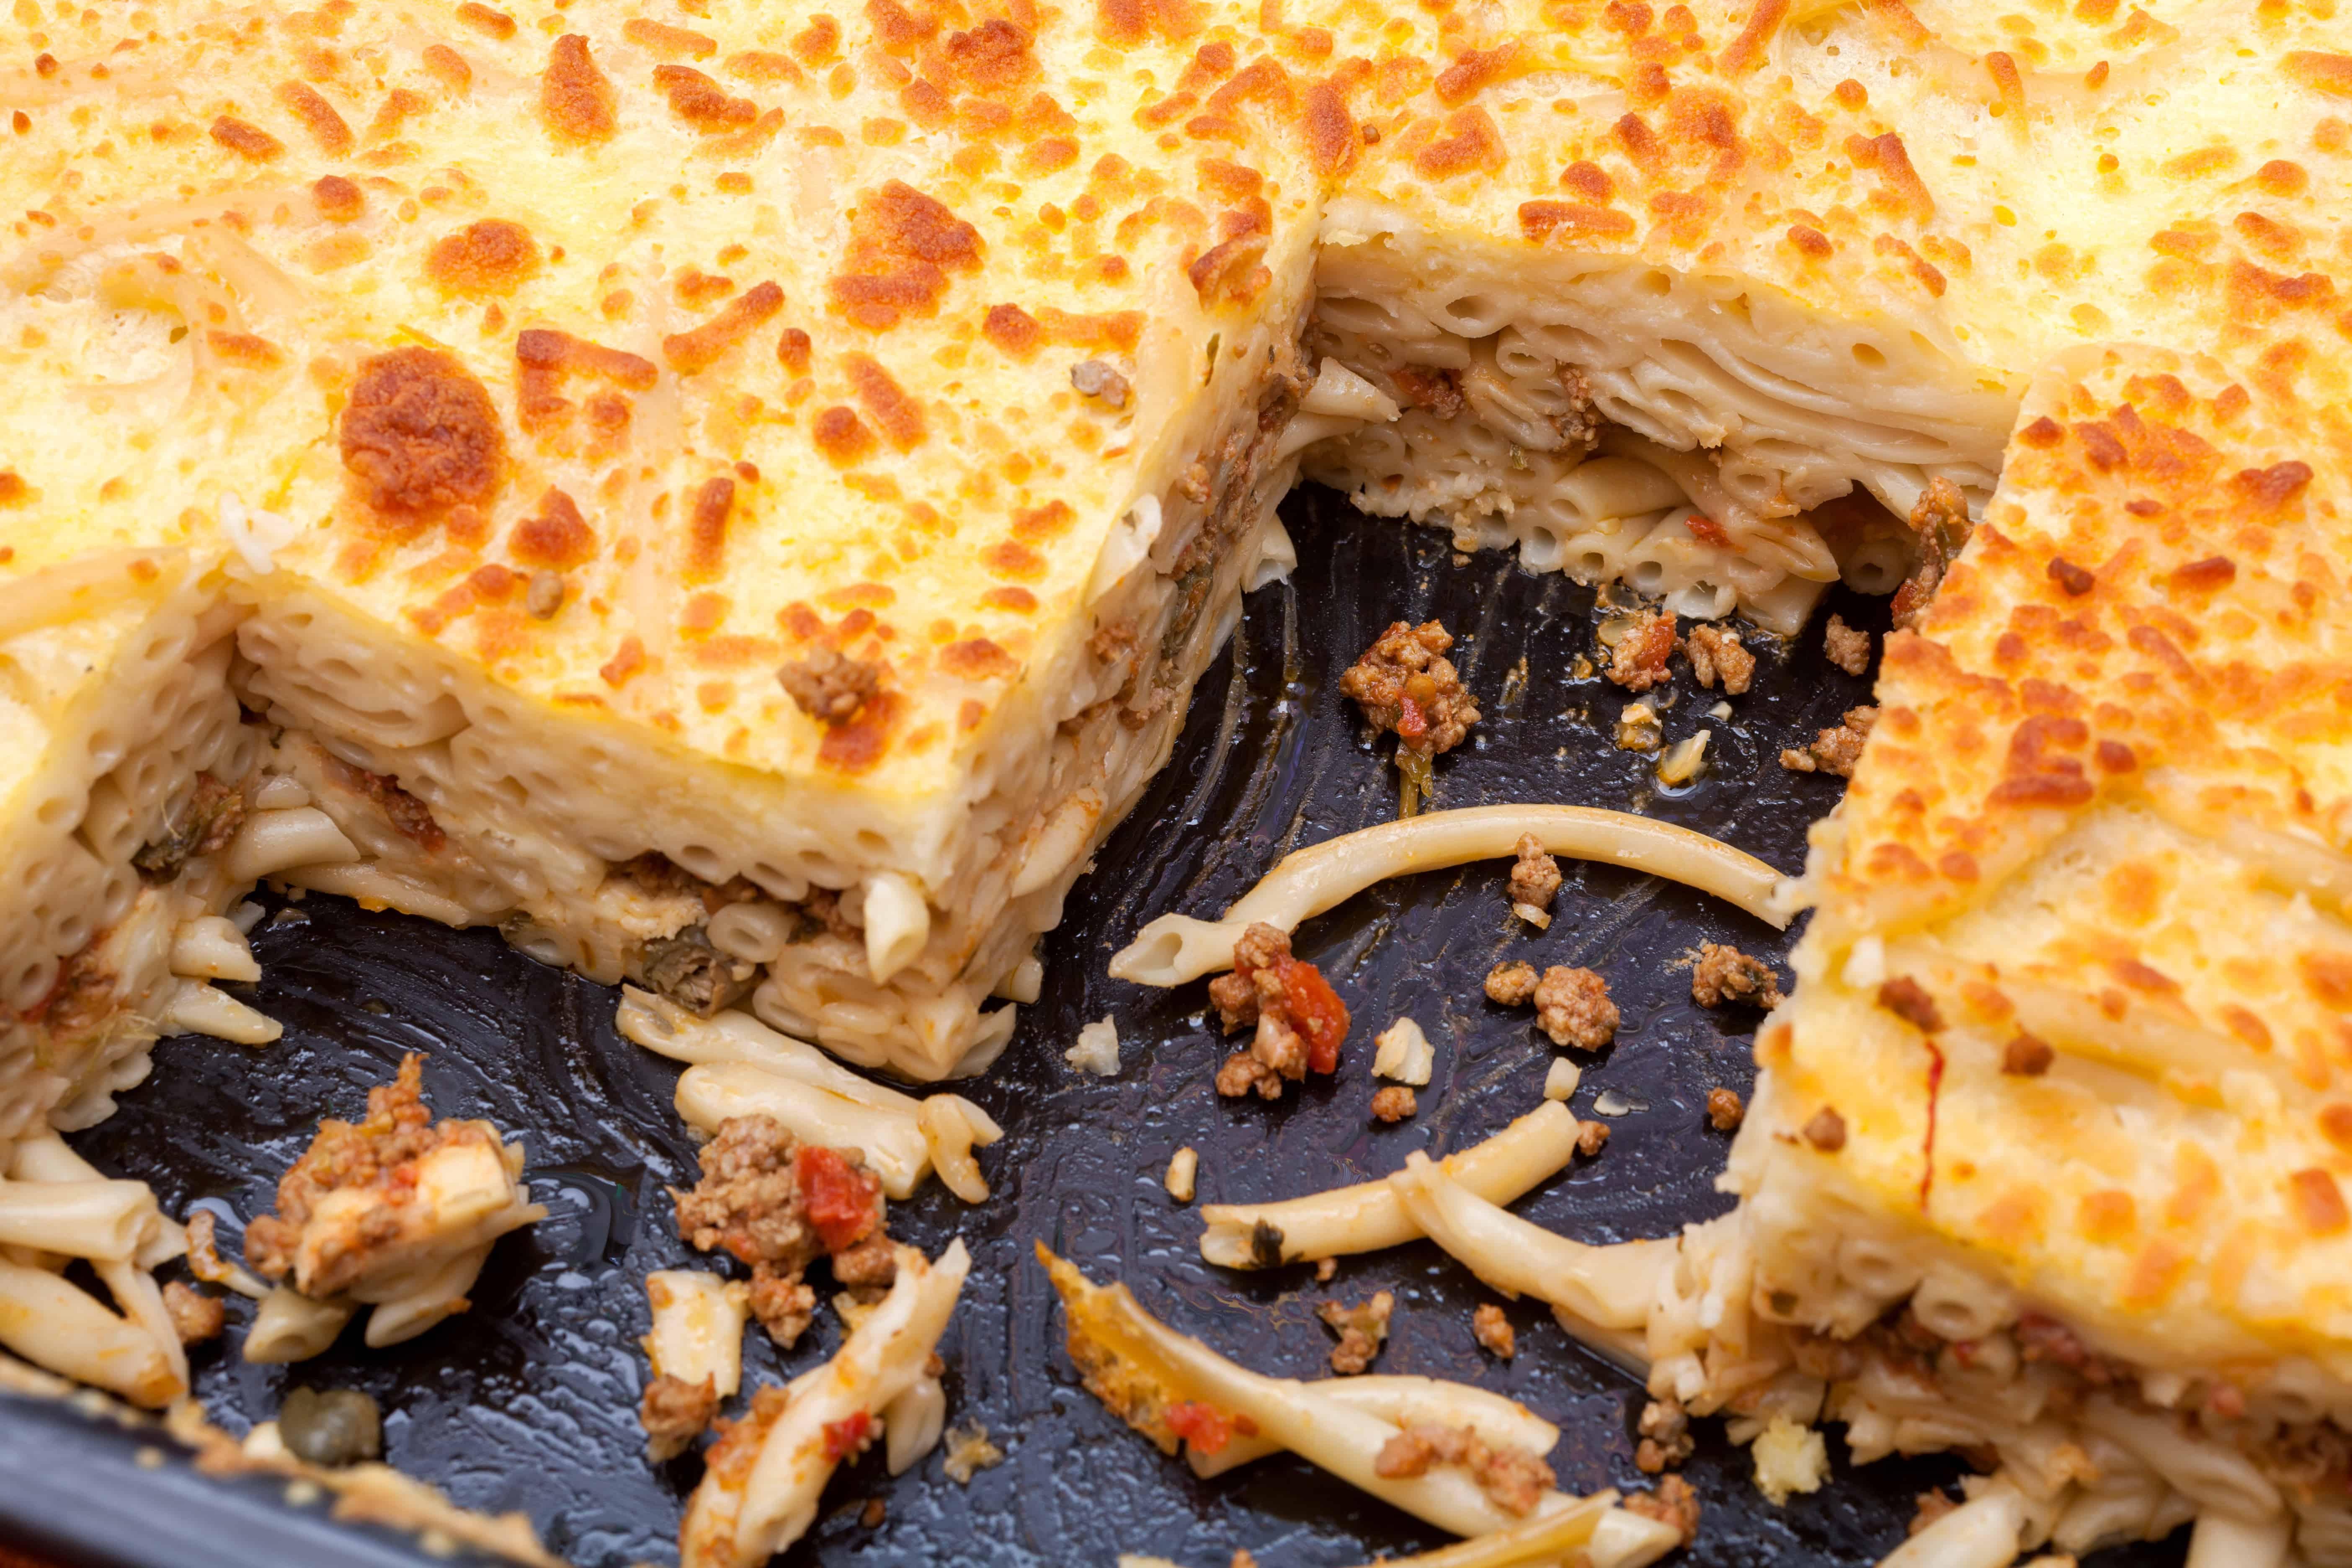 Greek Pastitsio recipe